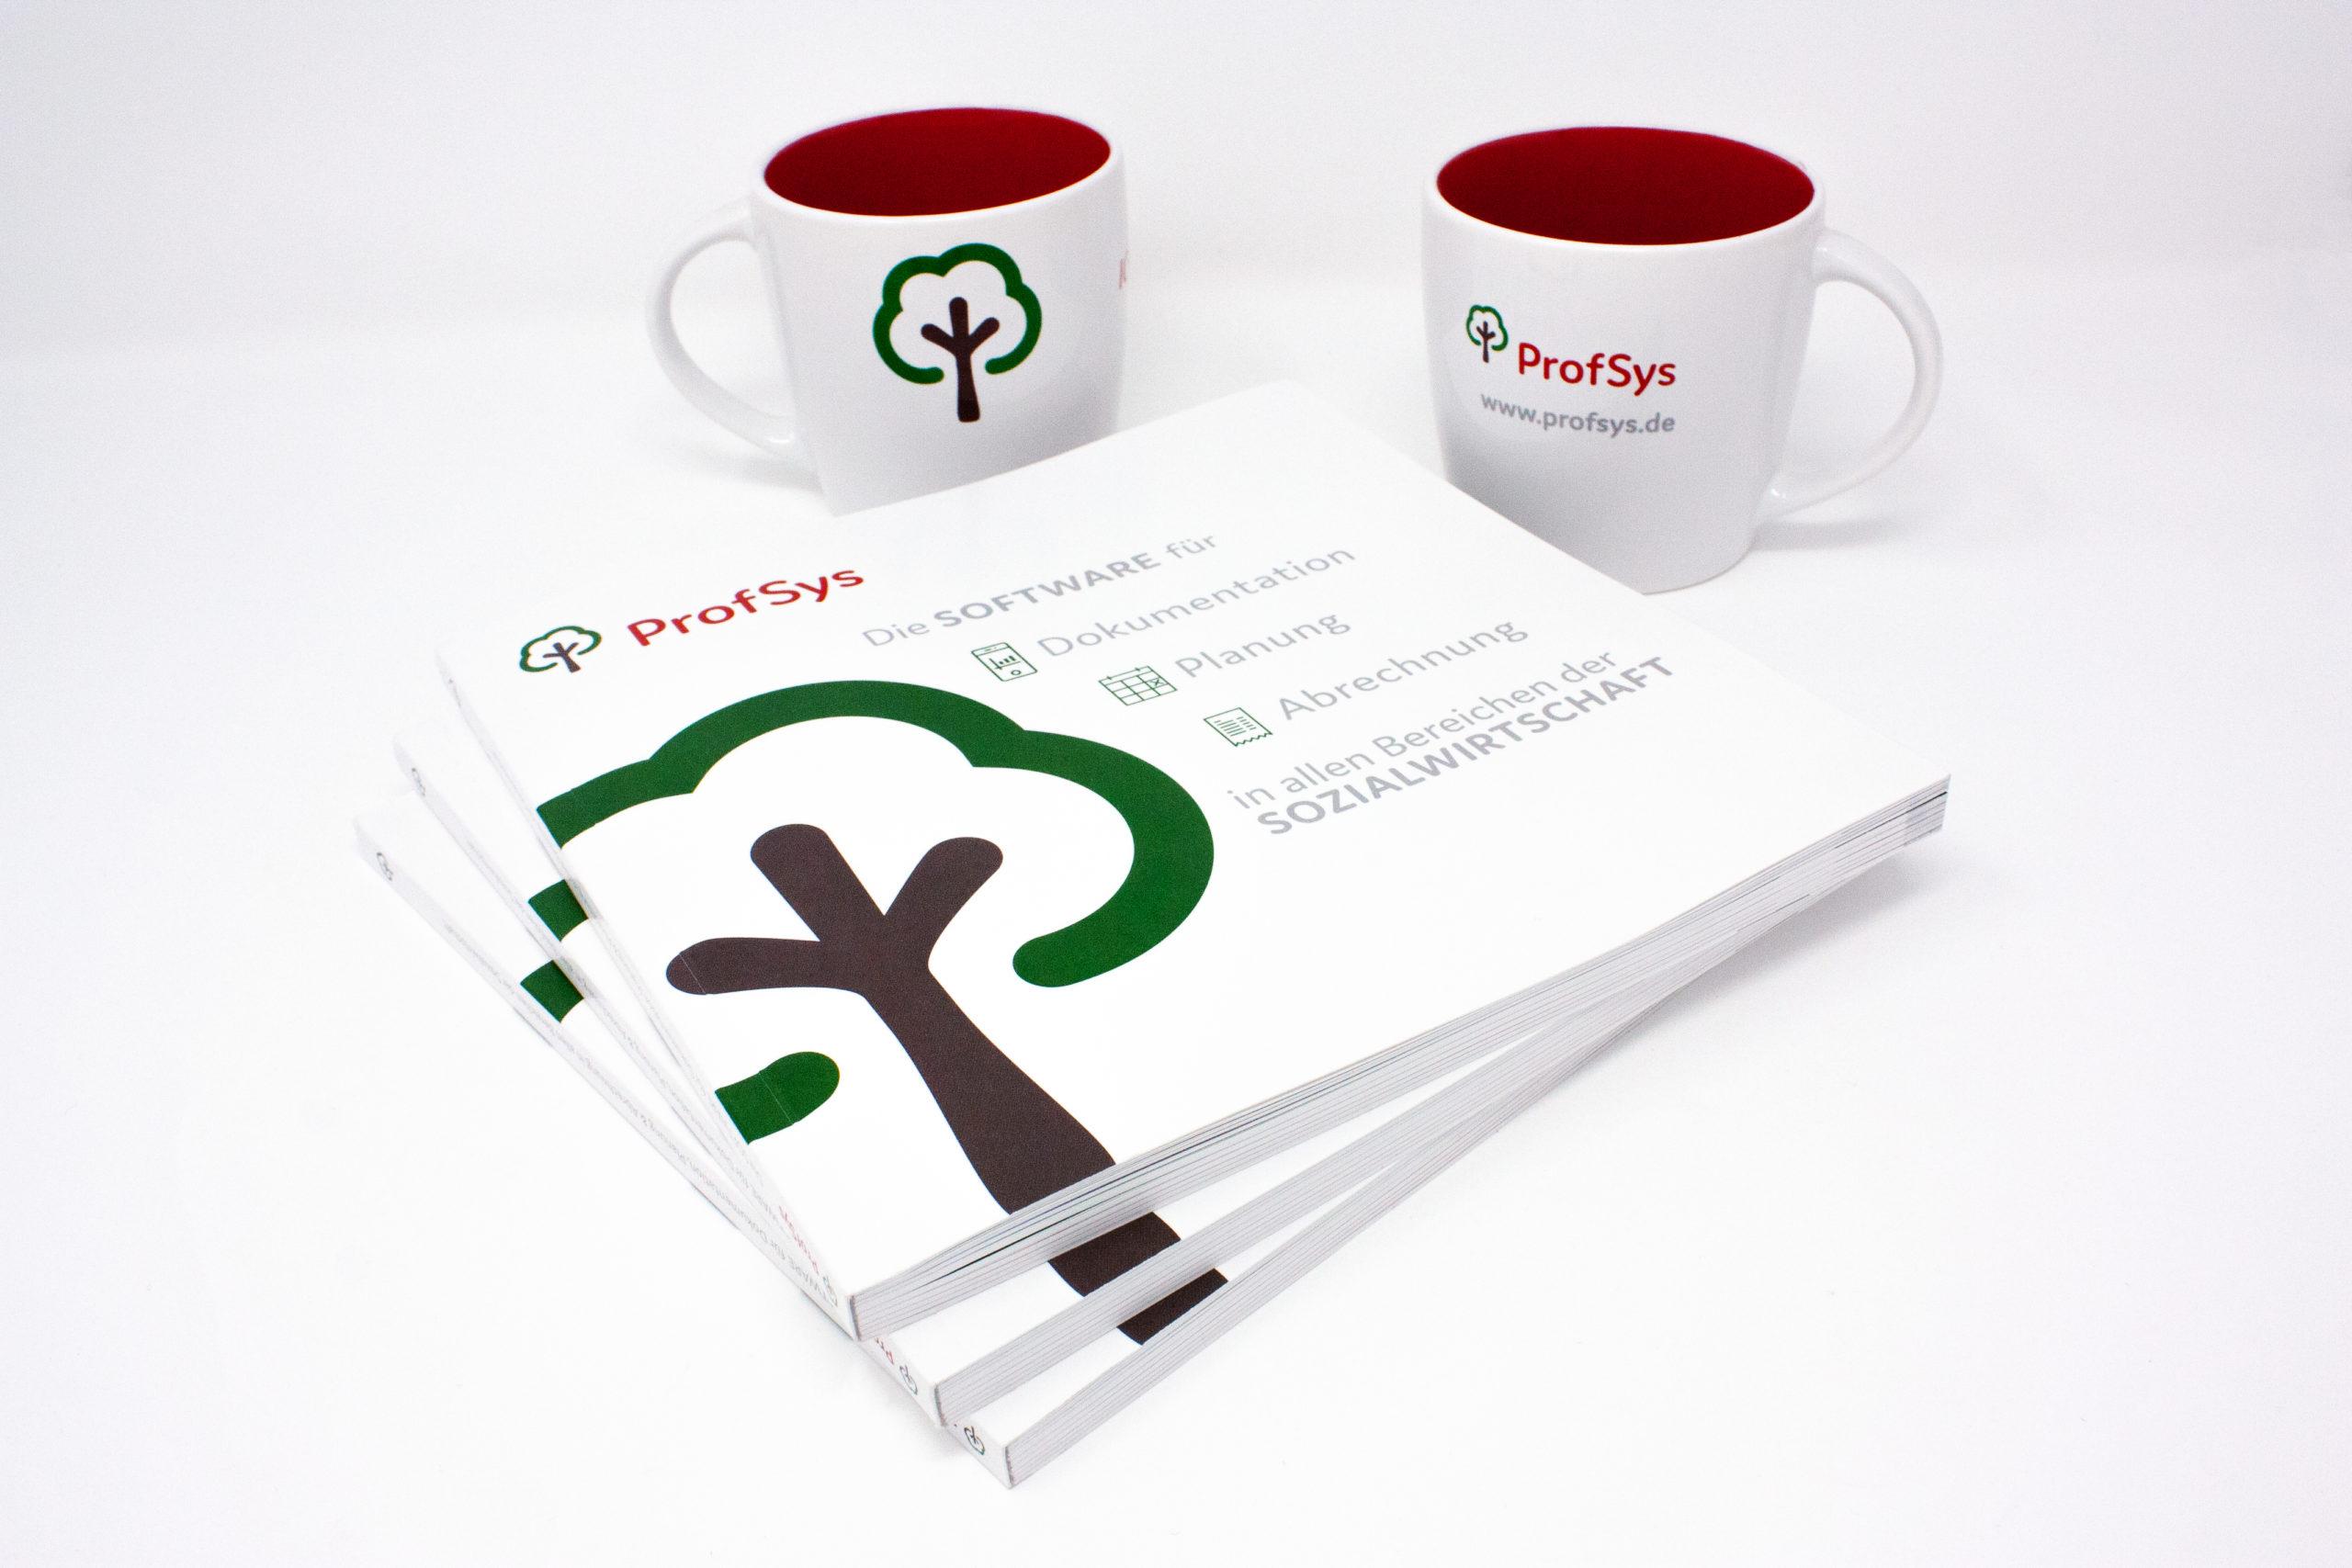 FORMLOS-ProfSys-Print-Broschüre-Corporate-Design-1